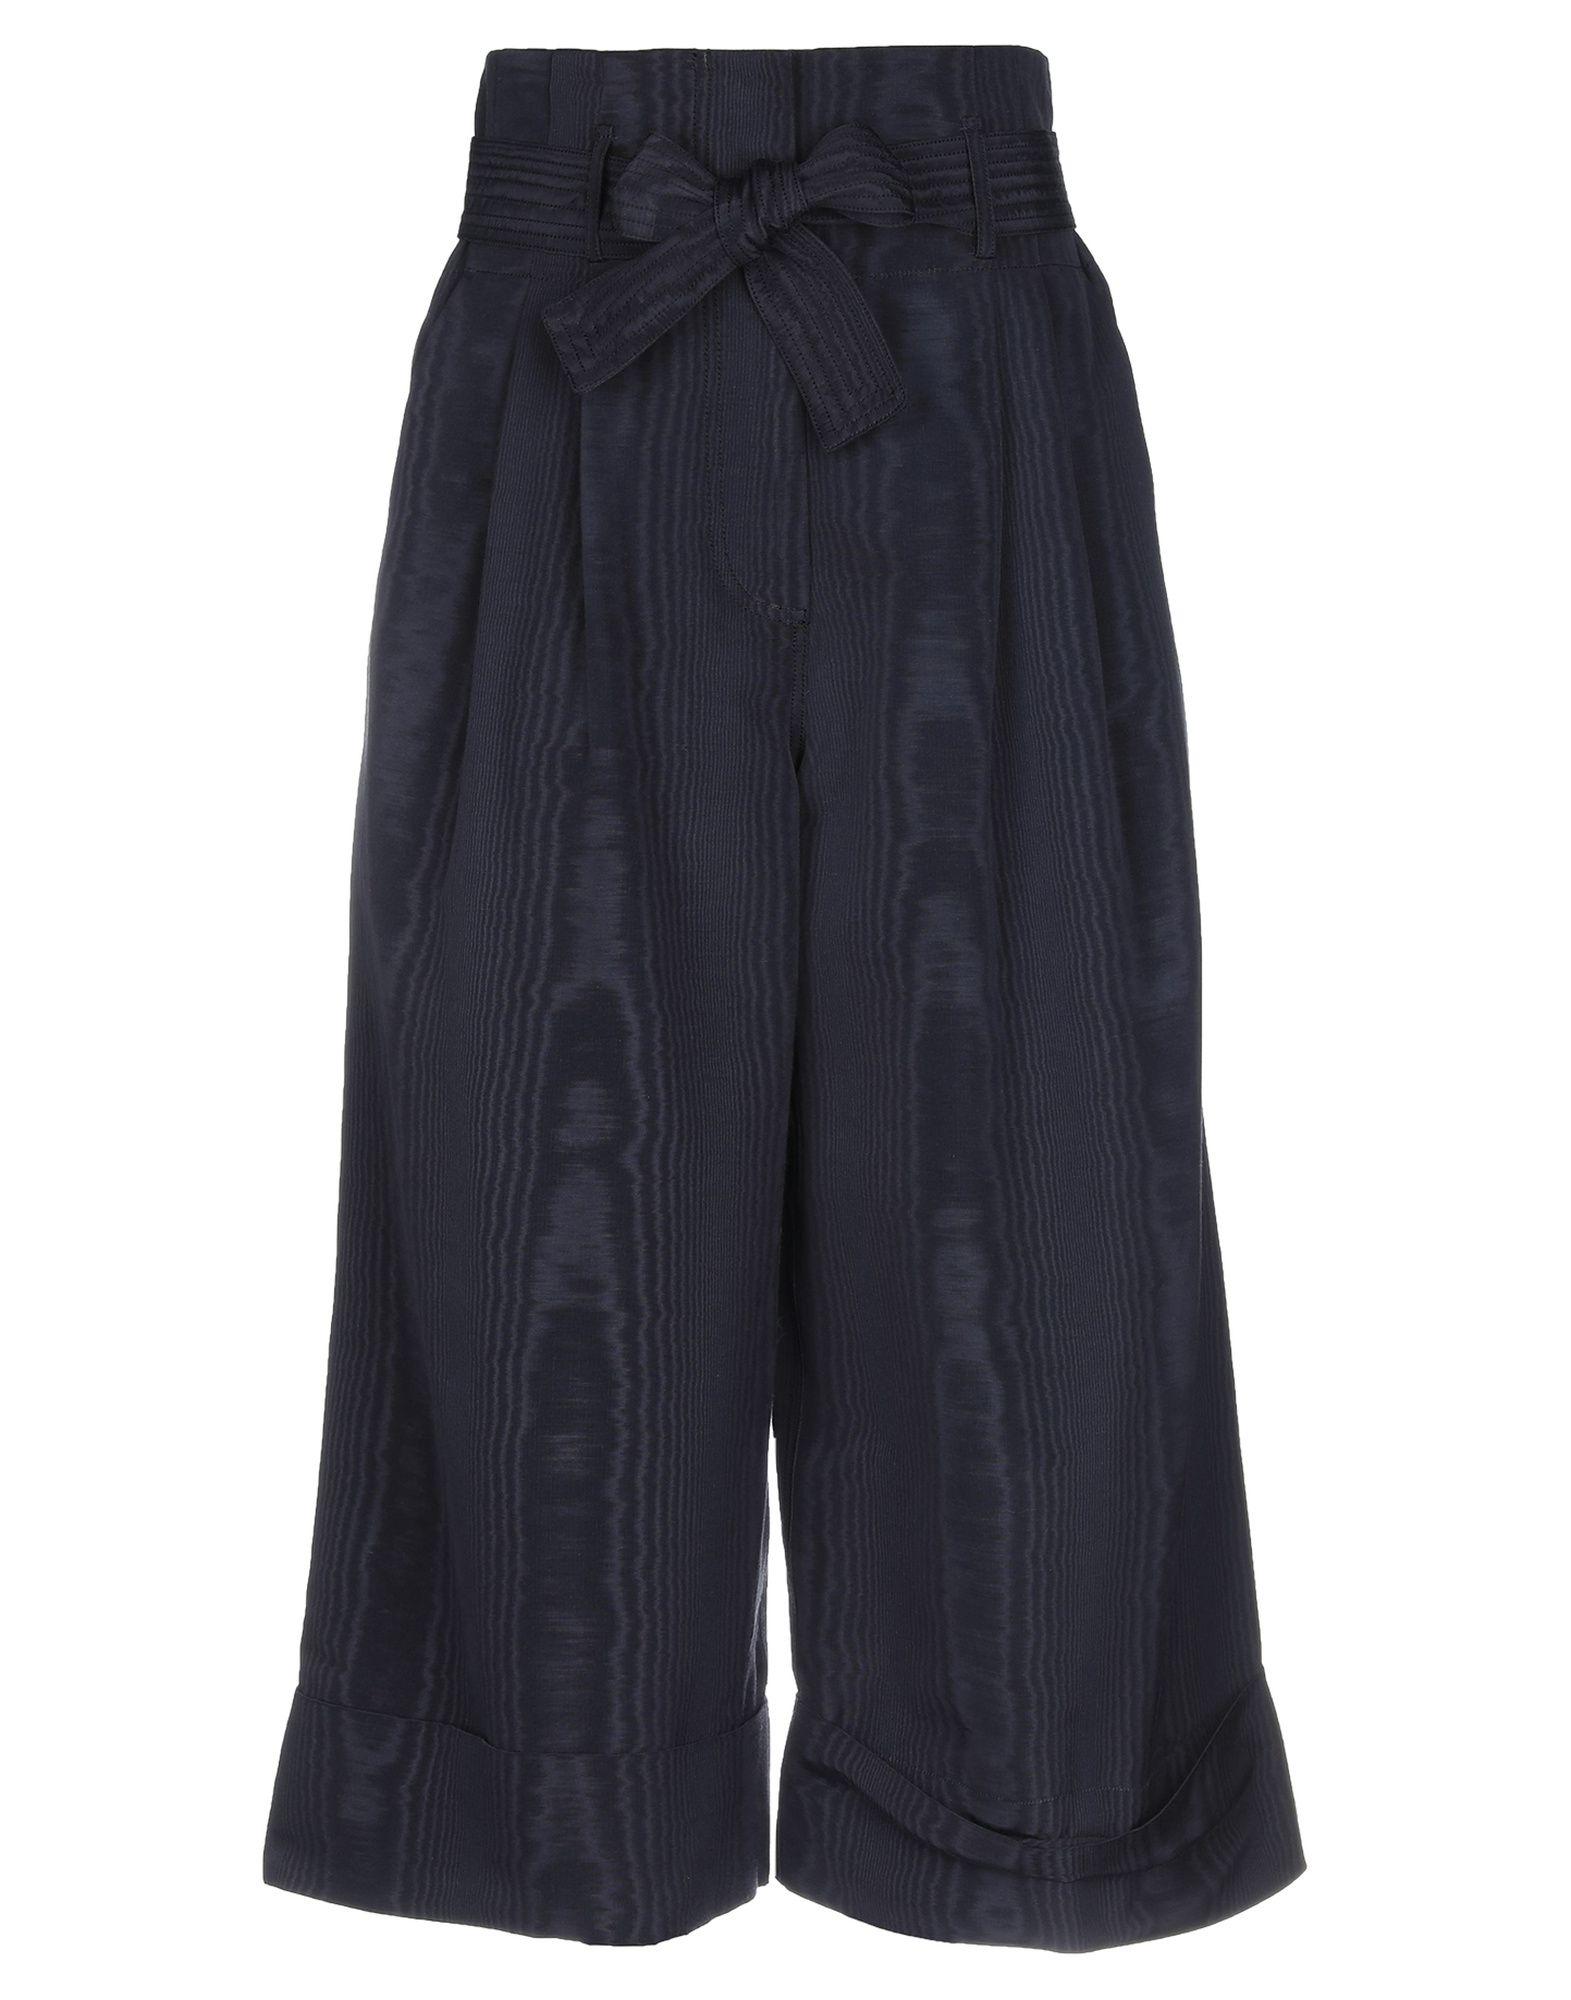 Pantalone Classico Adam Adam Lippes donna - 13324311JA